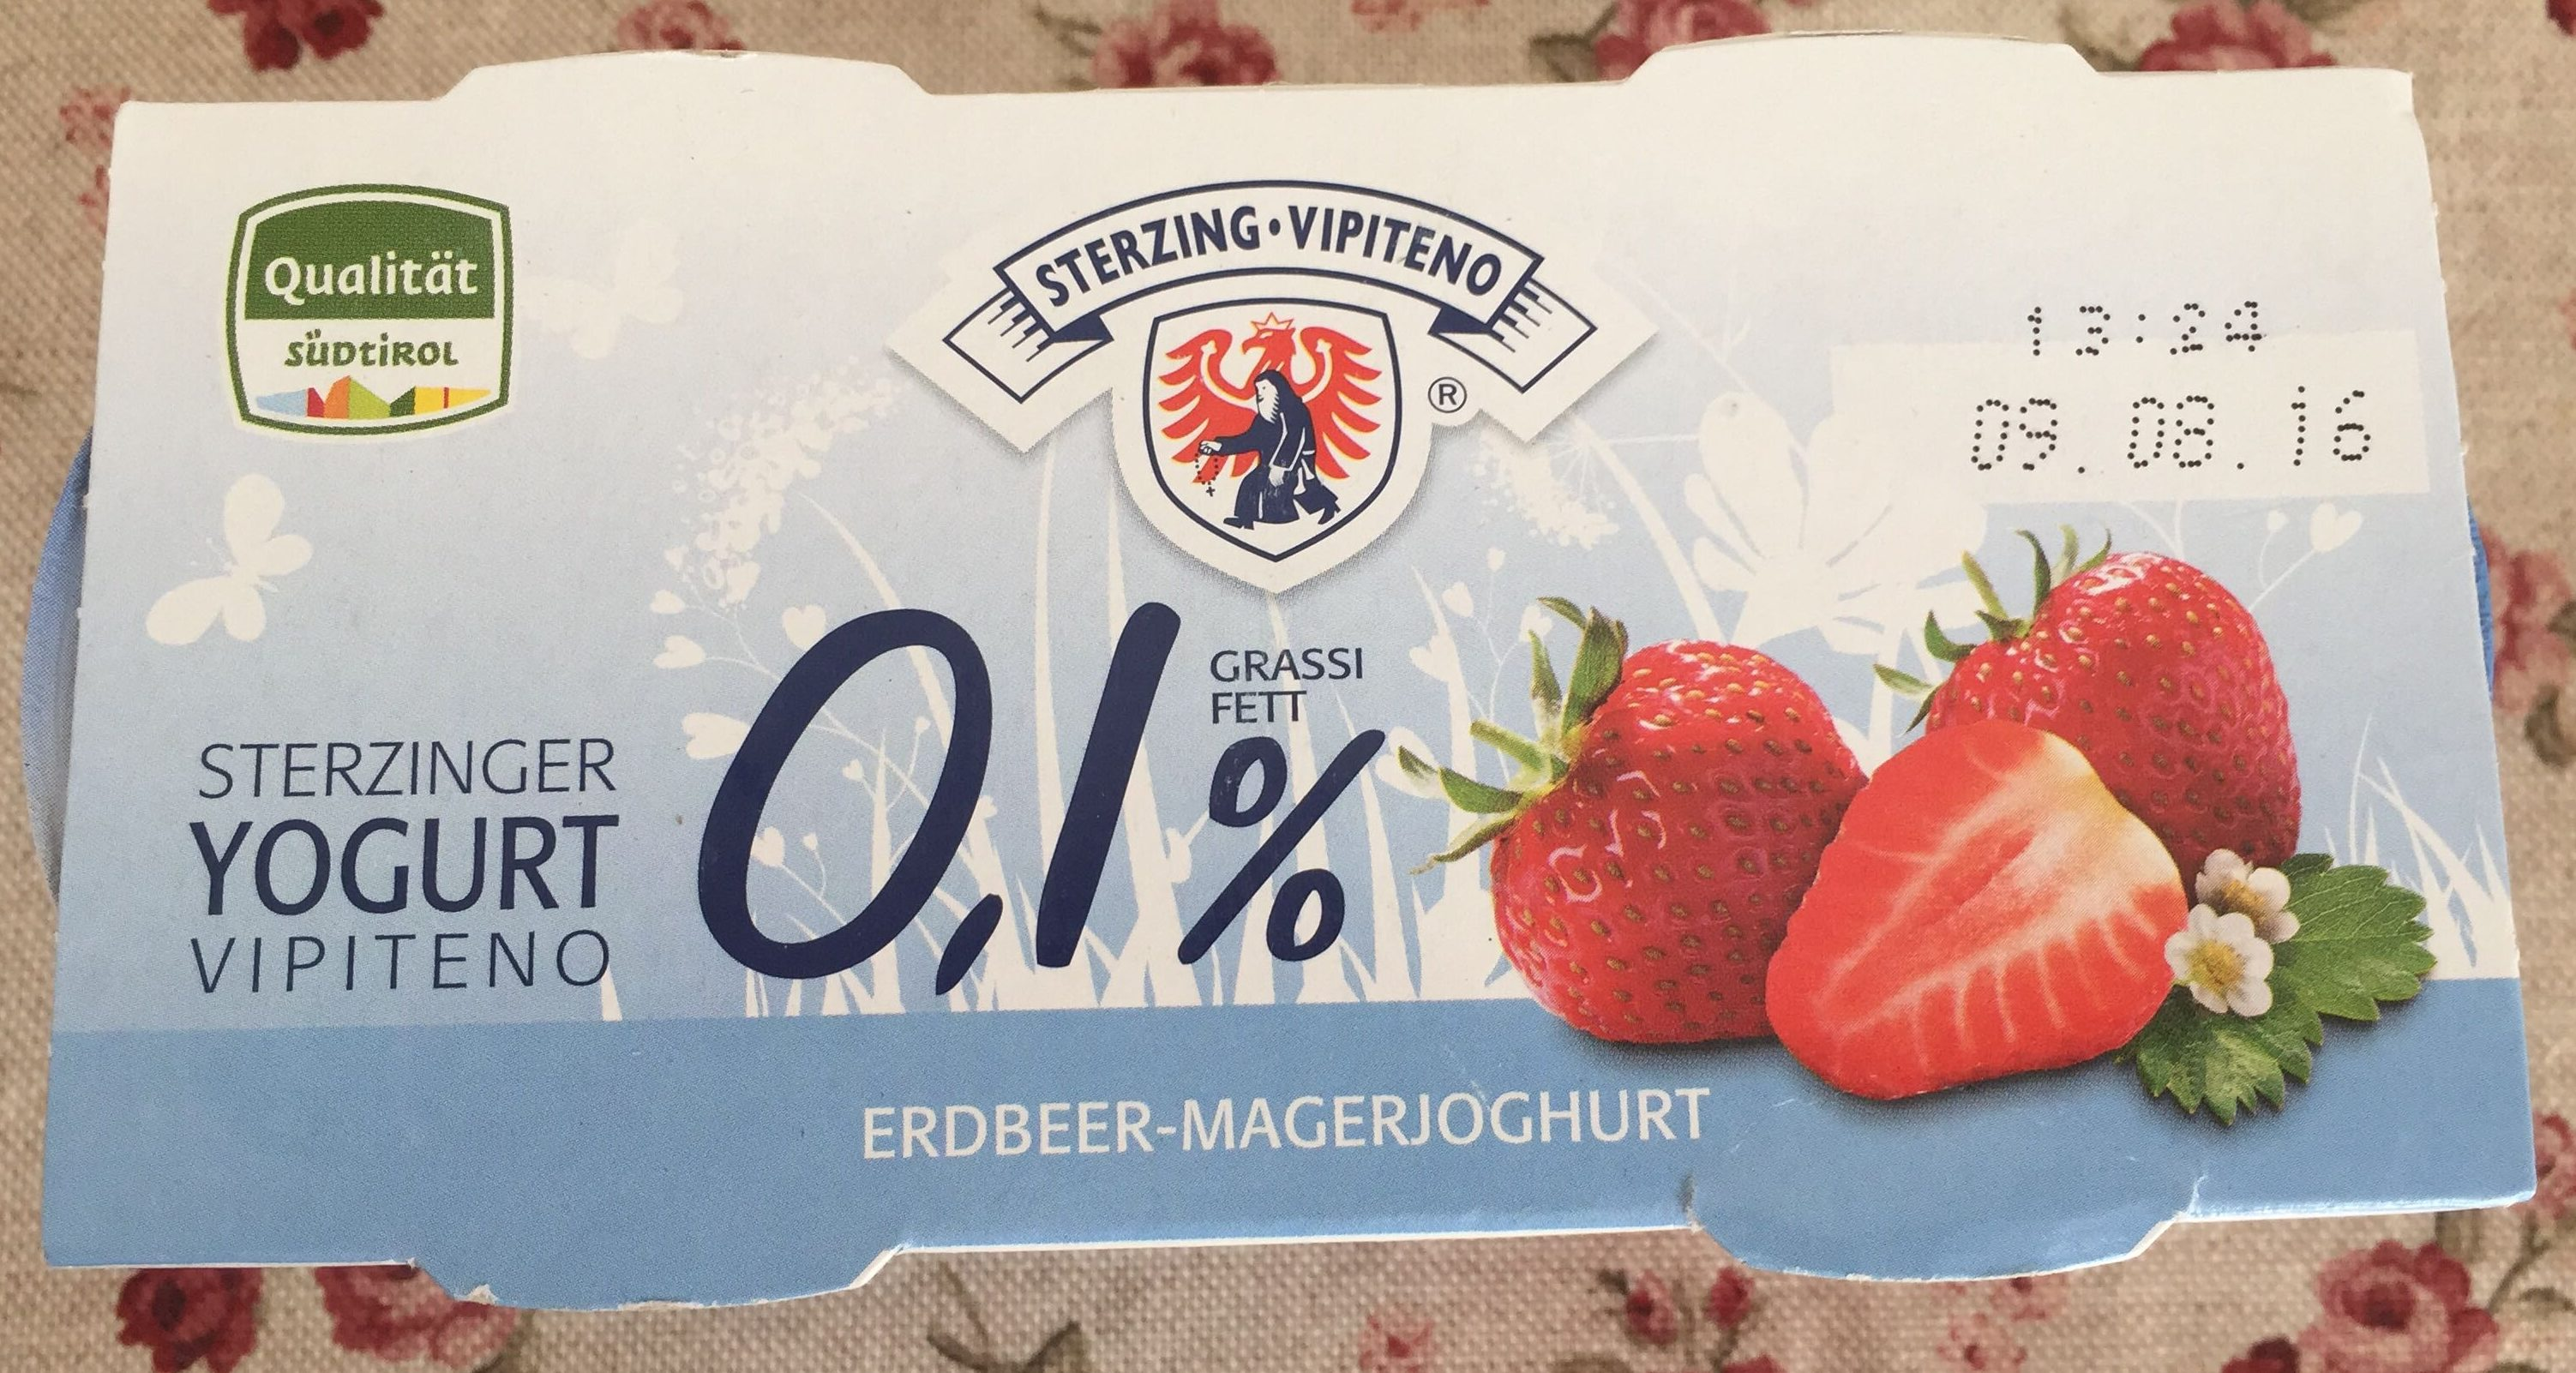 Yogurt fragola - Product